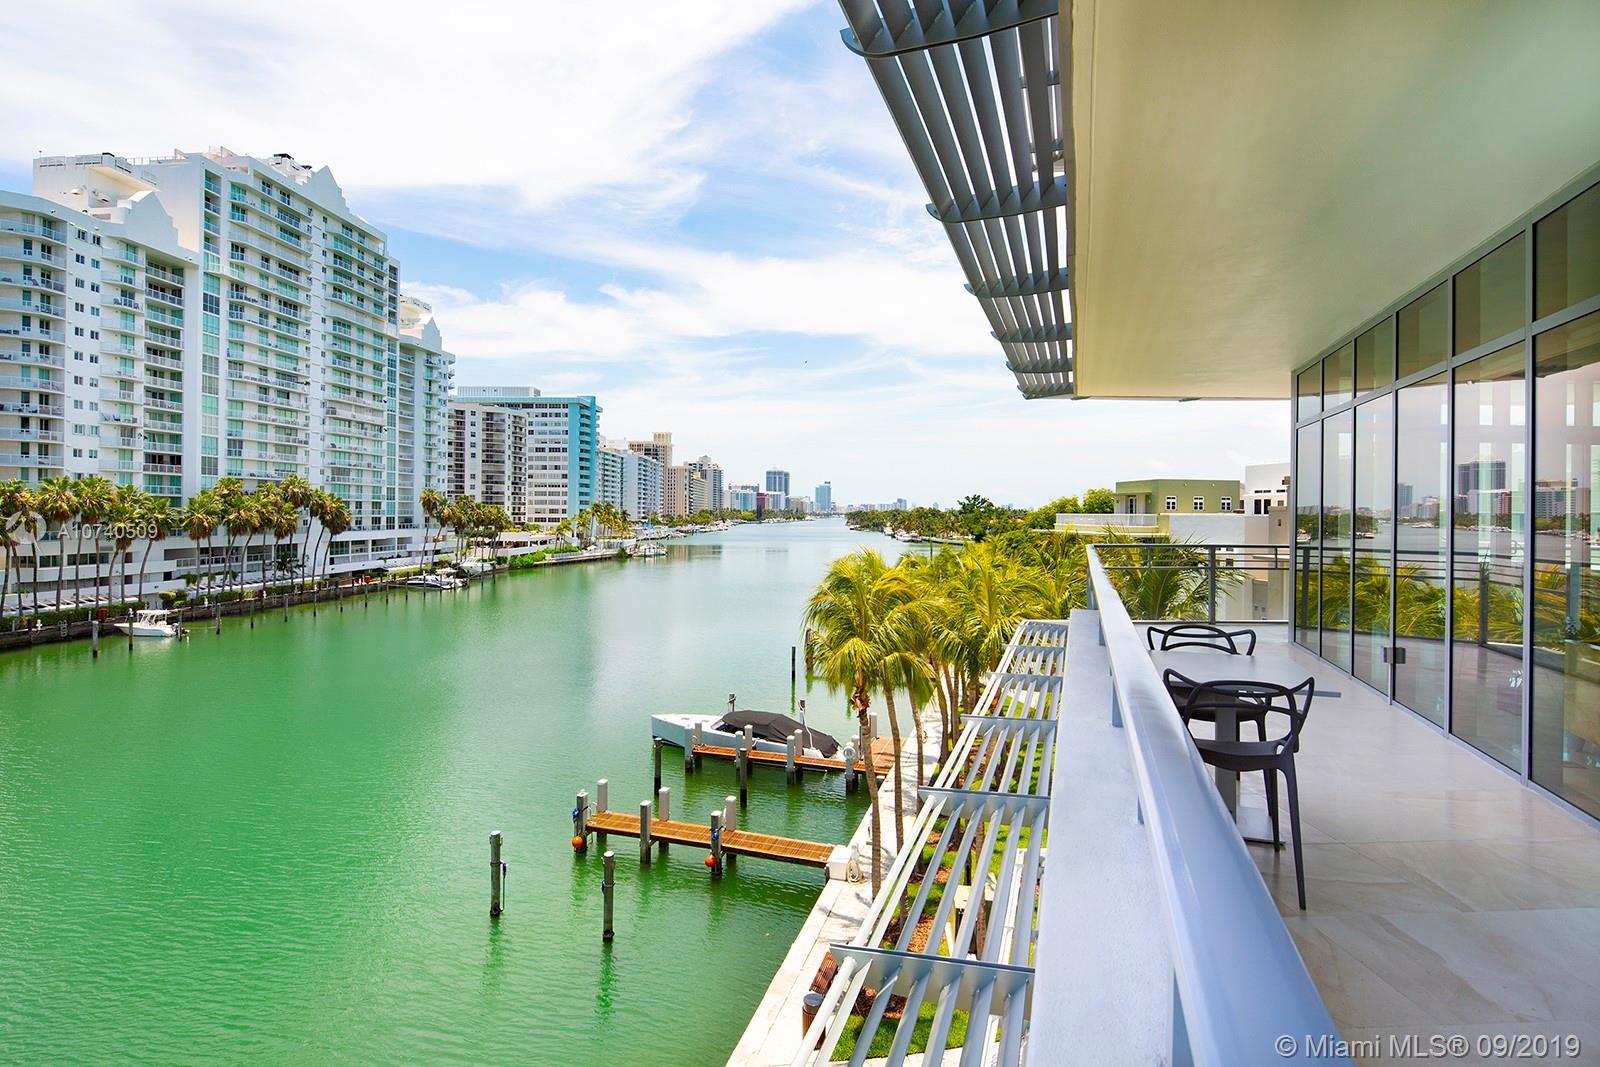 6101 Aqua Ave, 401 - Miami Beach, Florida